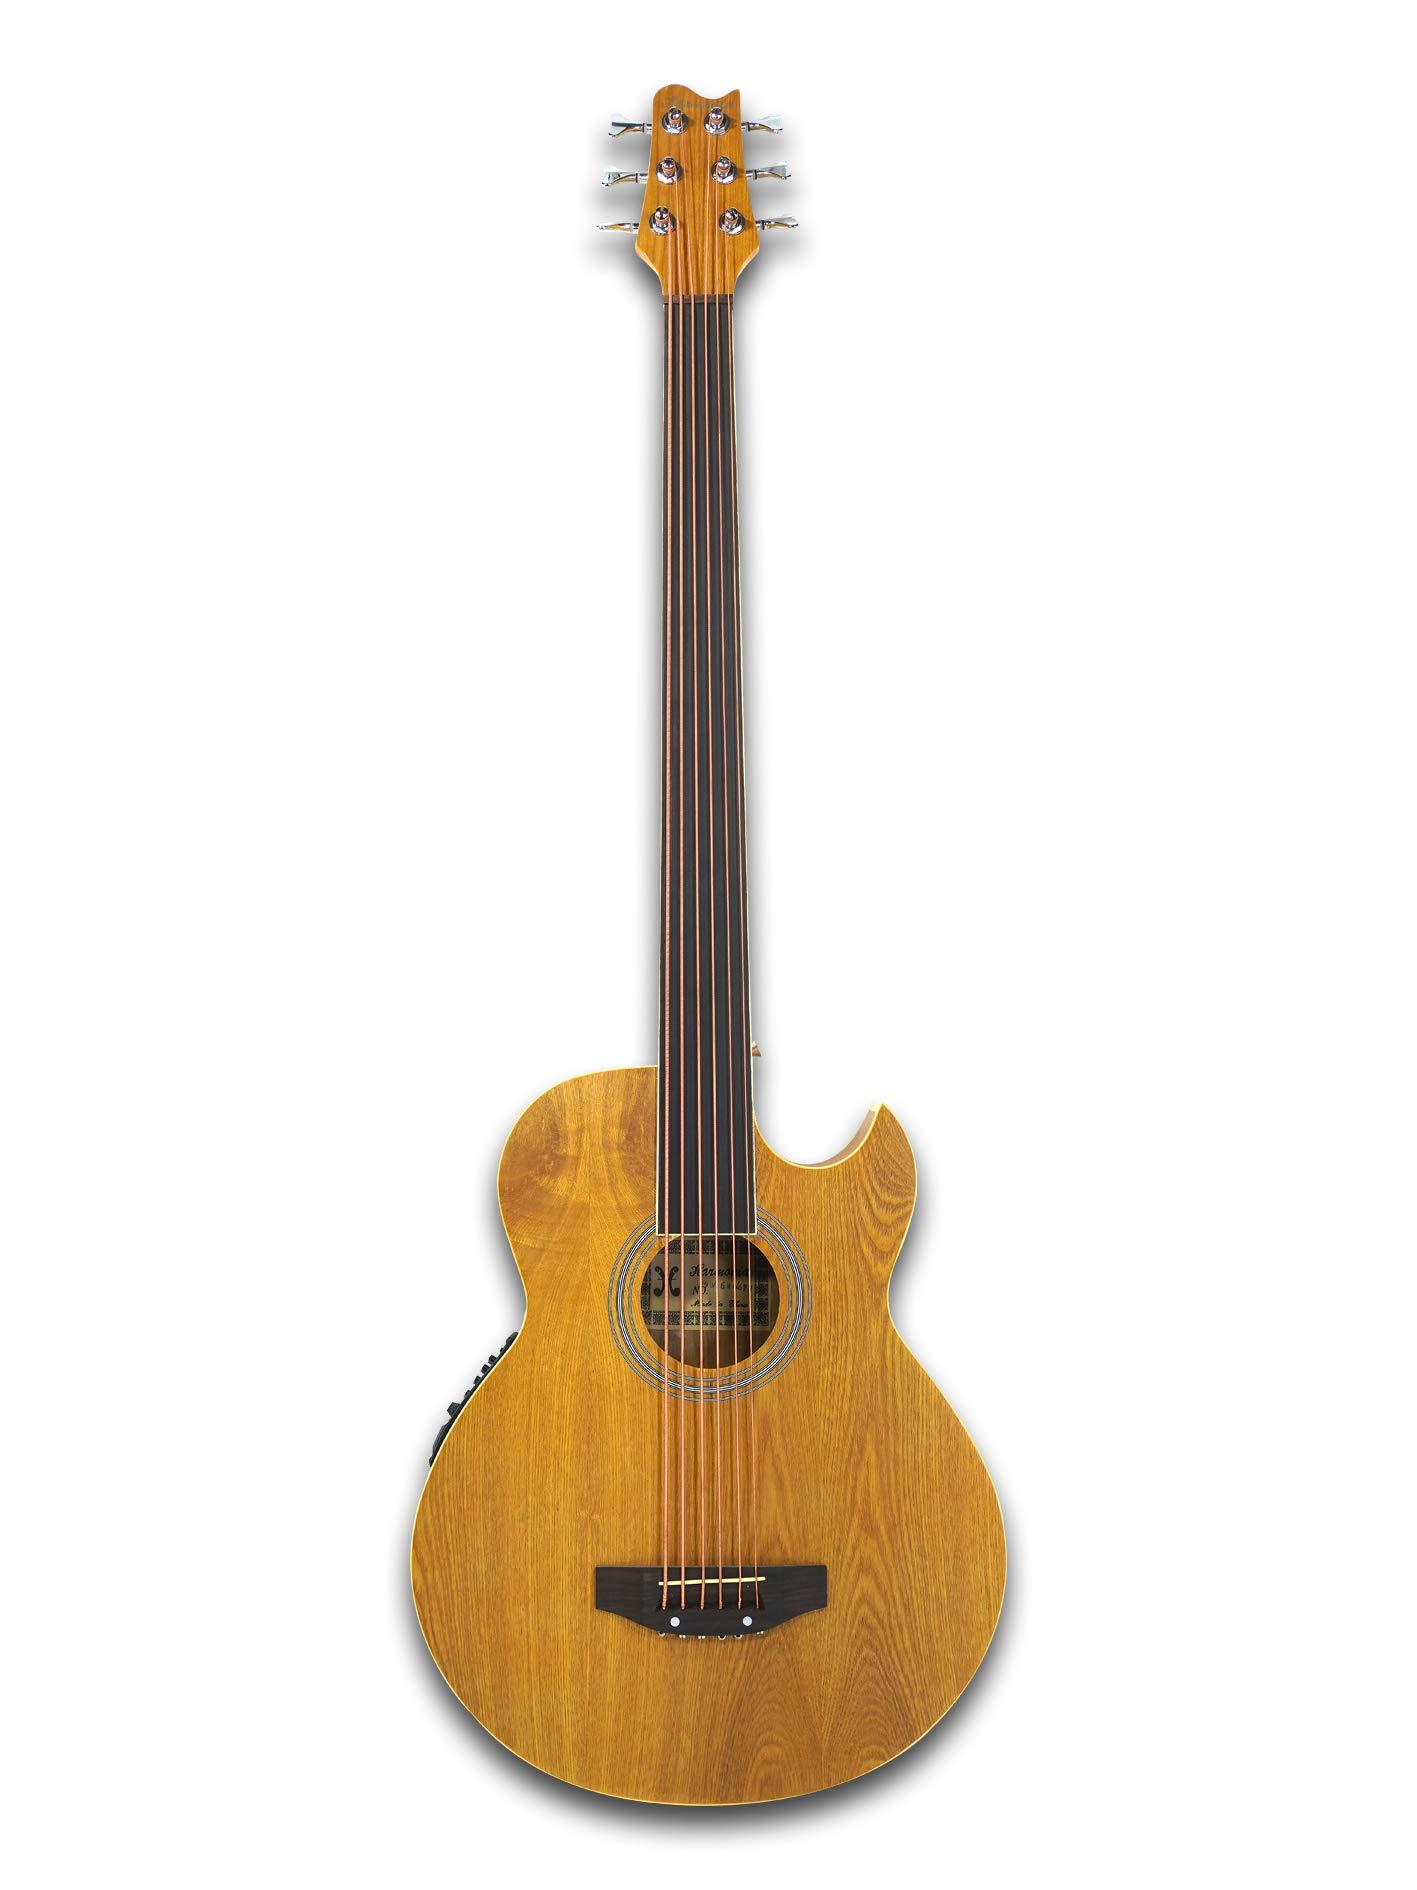 Fretless 6 String Acoustic Electric Cutaway Bass Guitar